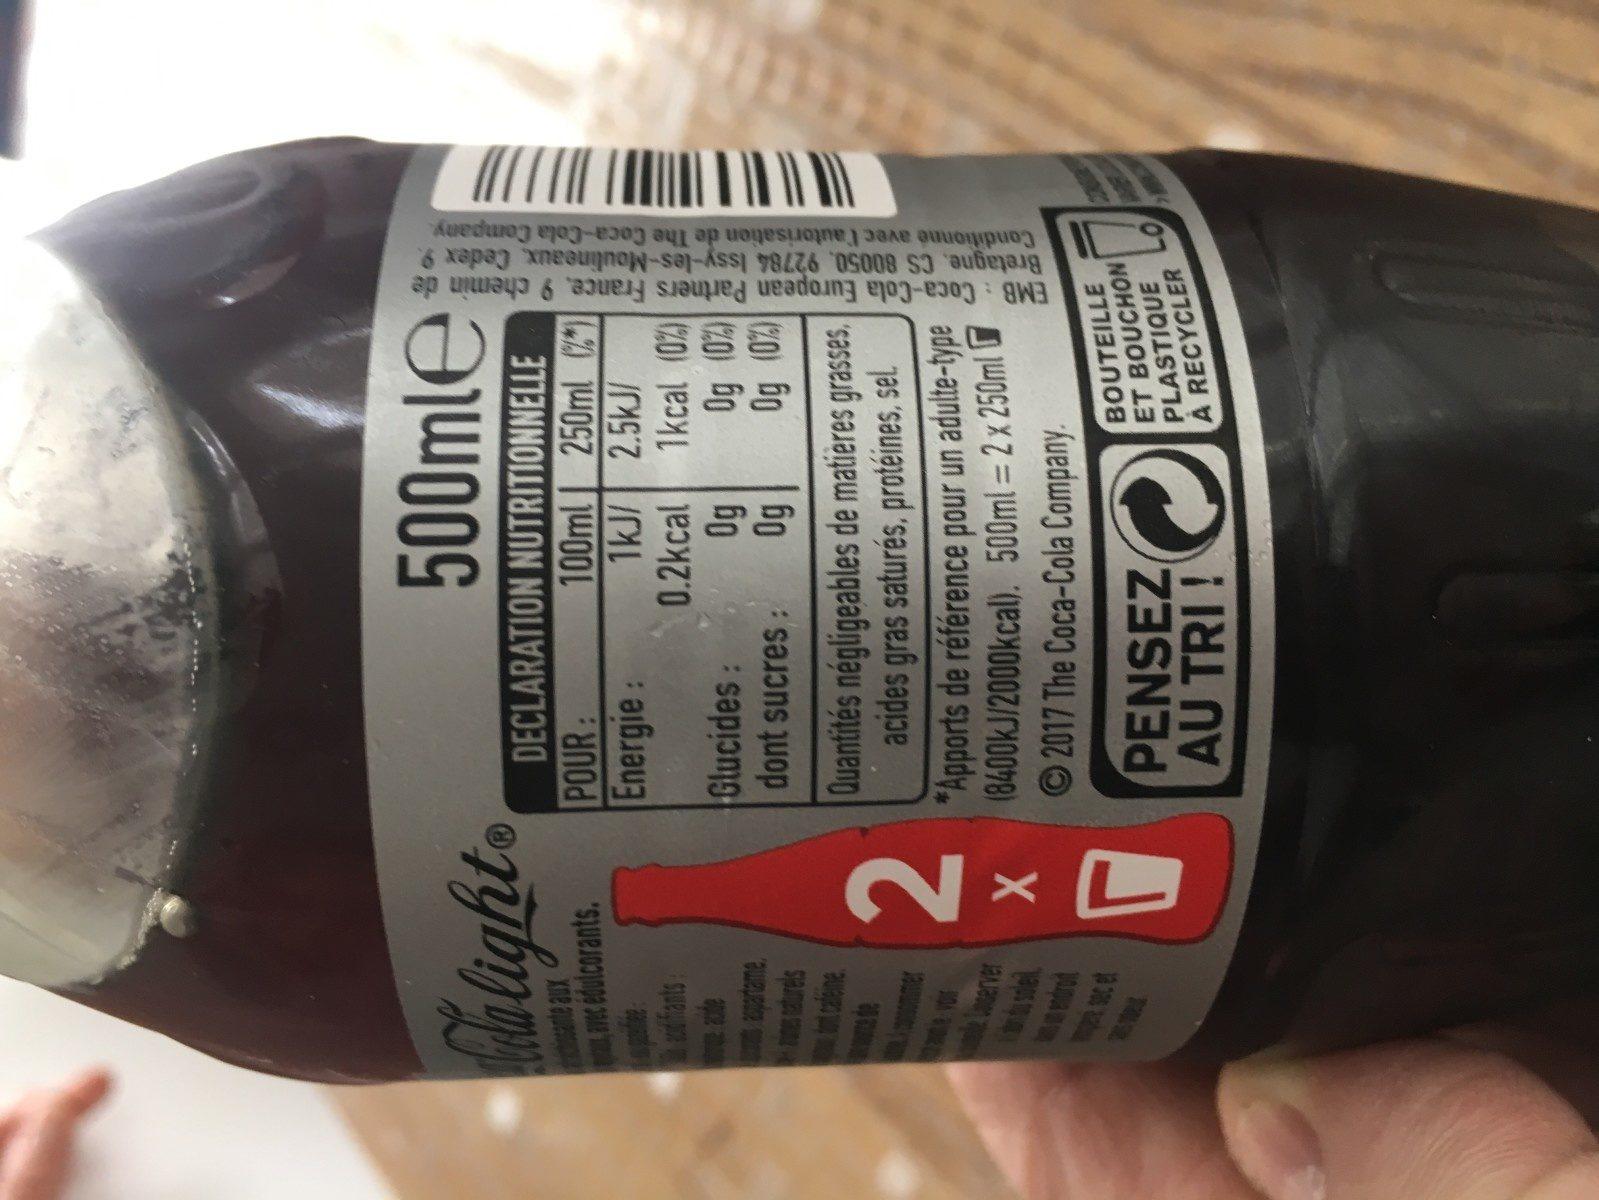 Coca cola light - Ingrédients